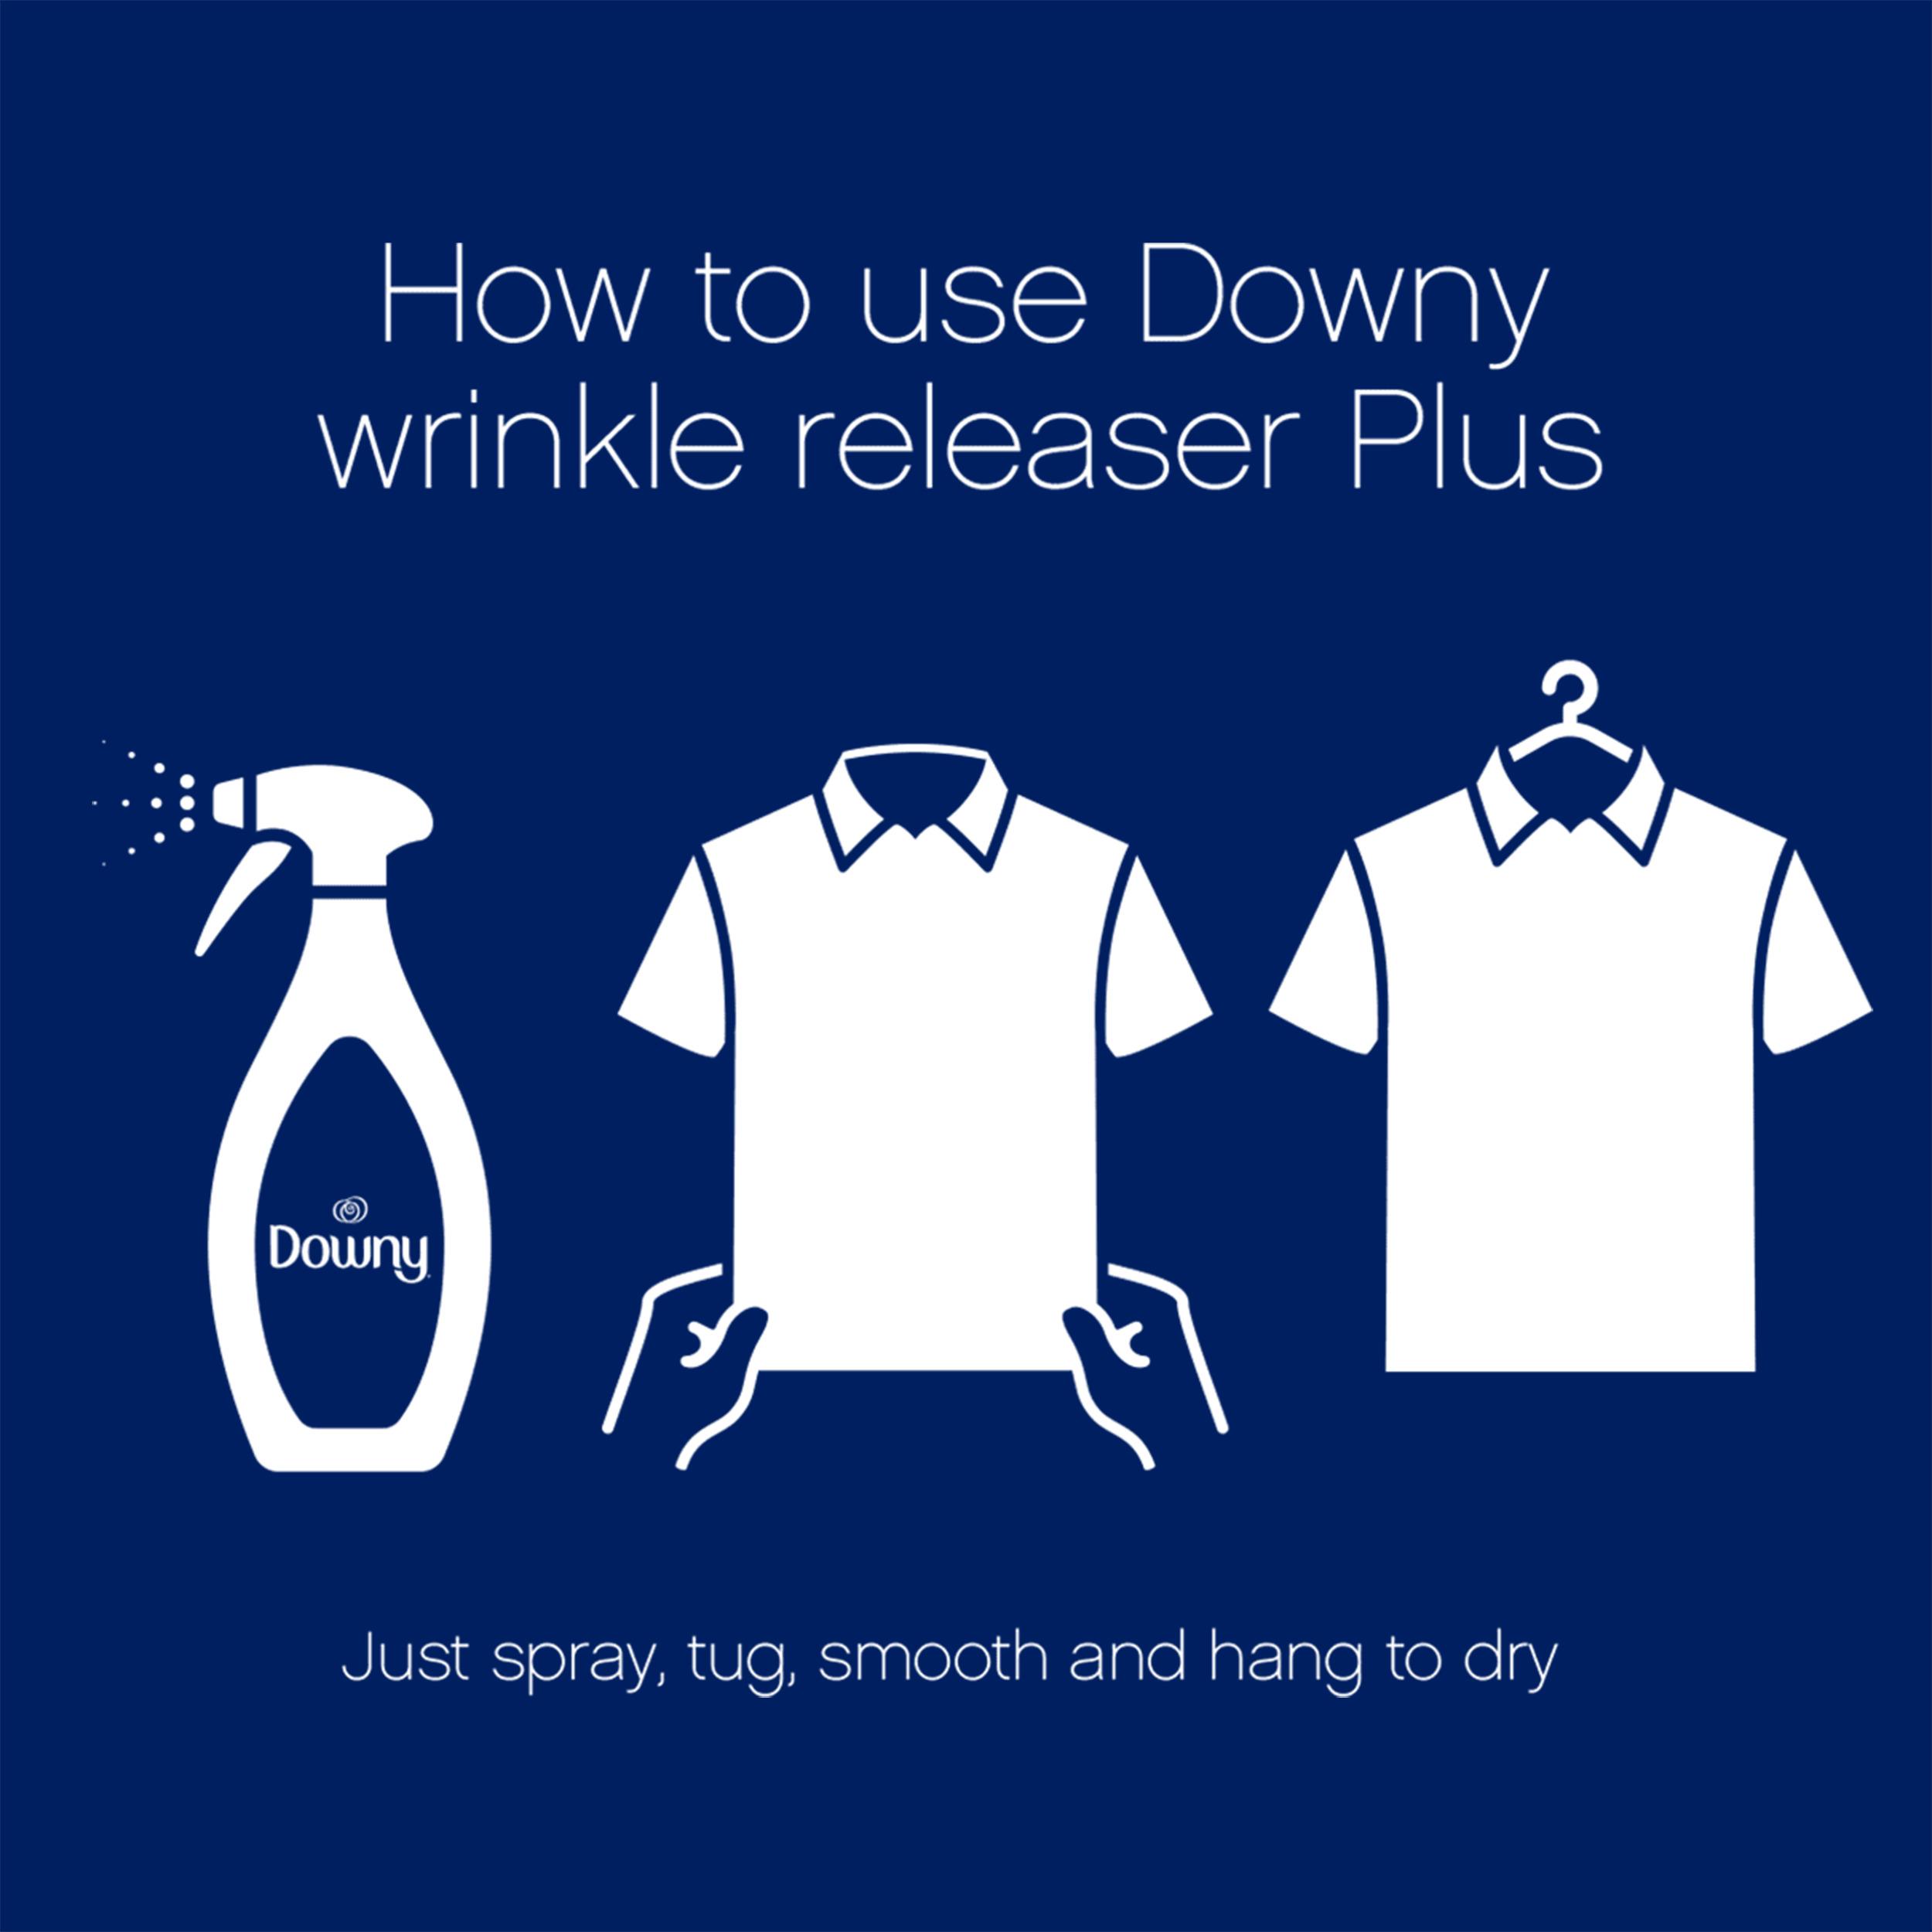 Downy Wrinkle Releaser Fabric Refresher, Crisp Linen Scent, 16.9 fl oz